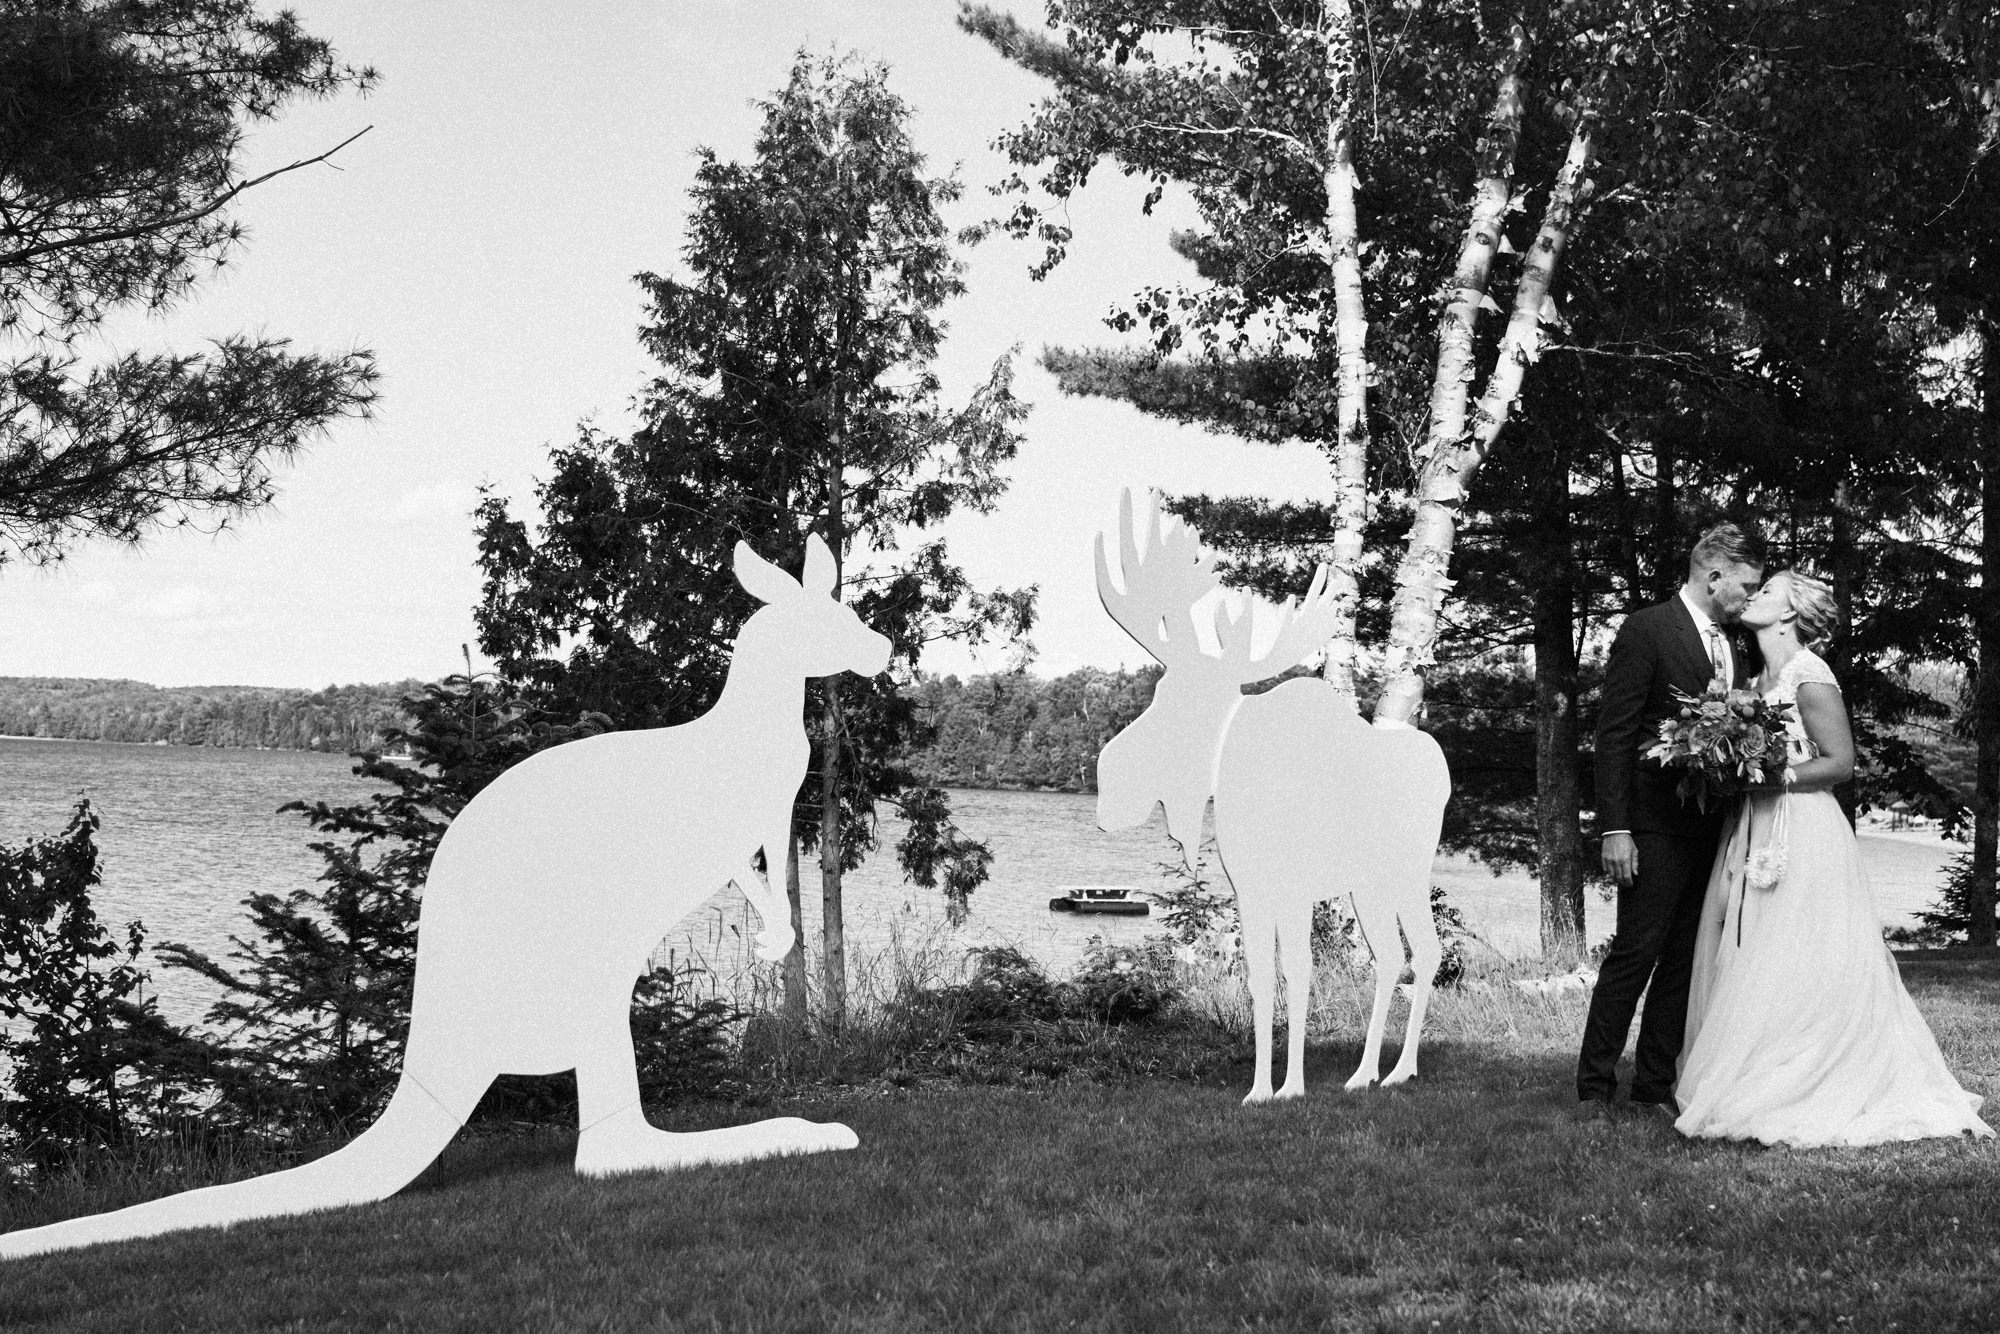 moose and kangaroo